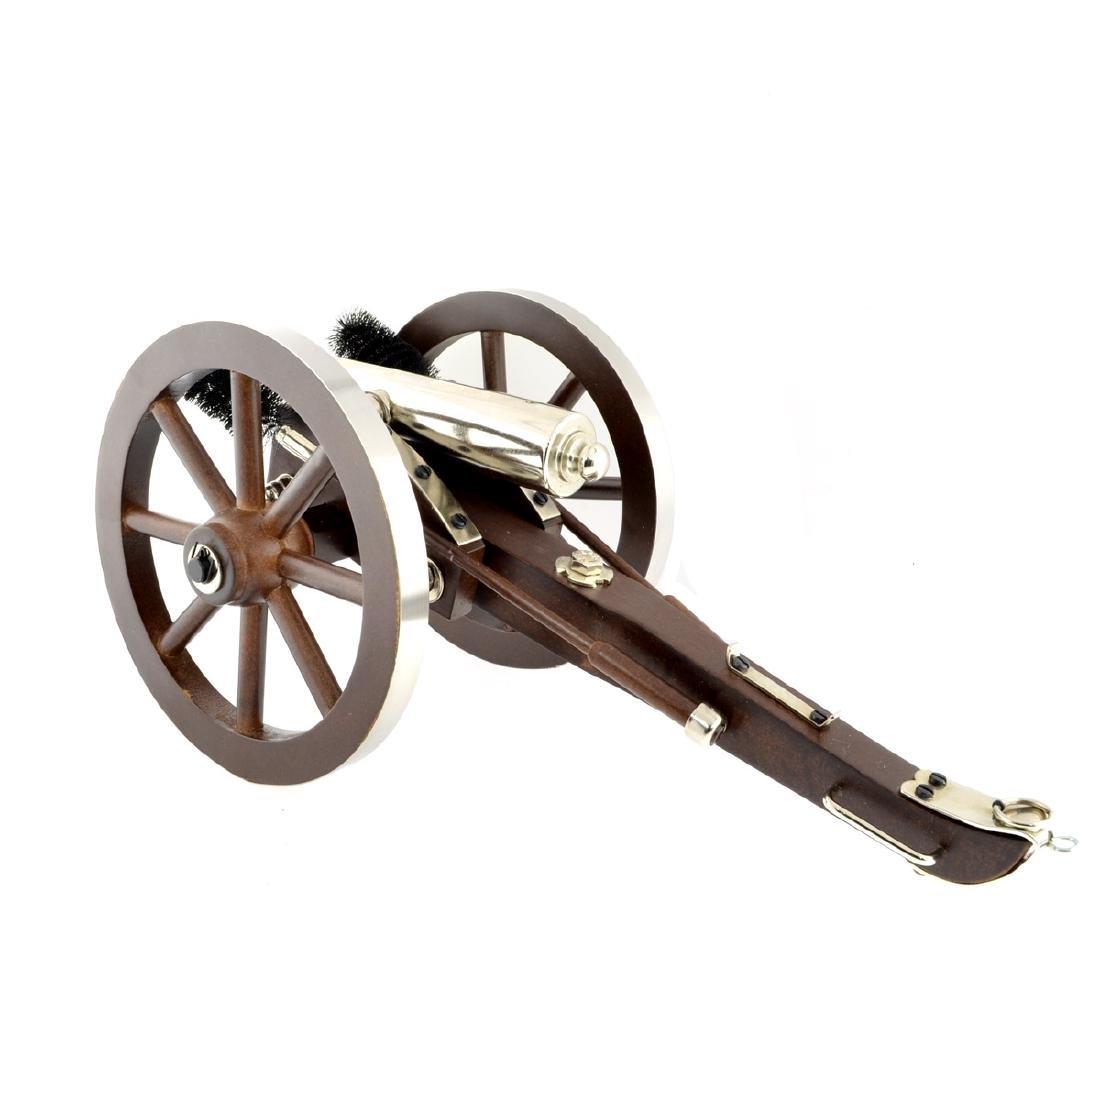 Mini Napoleon III Cannon .50 Cal Smoothrore - 11/4'' - 2